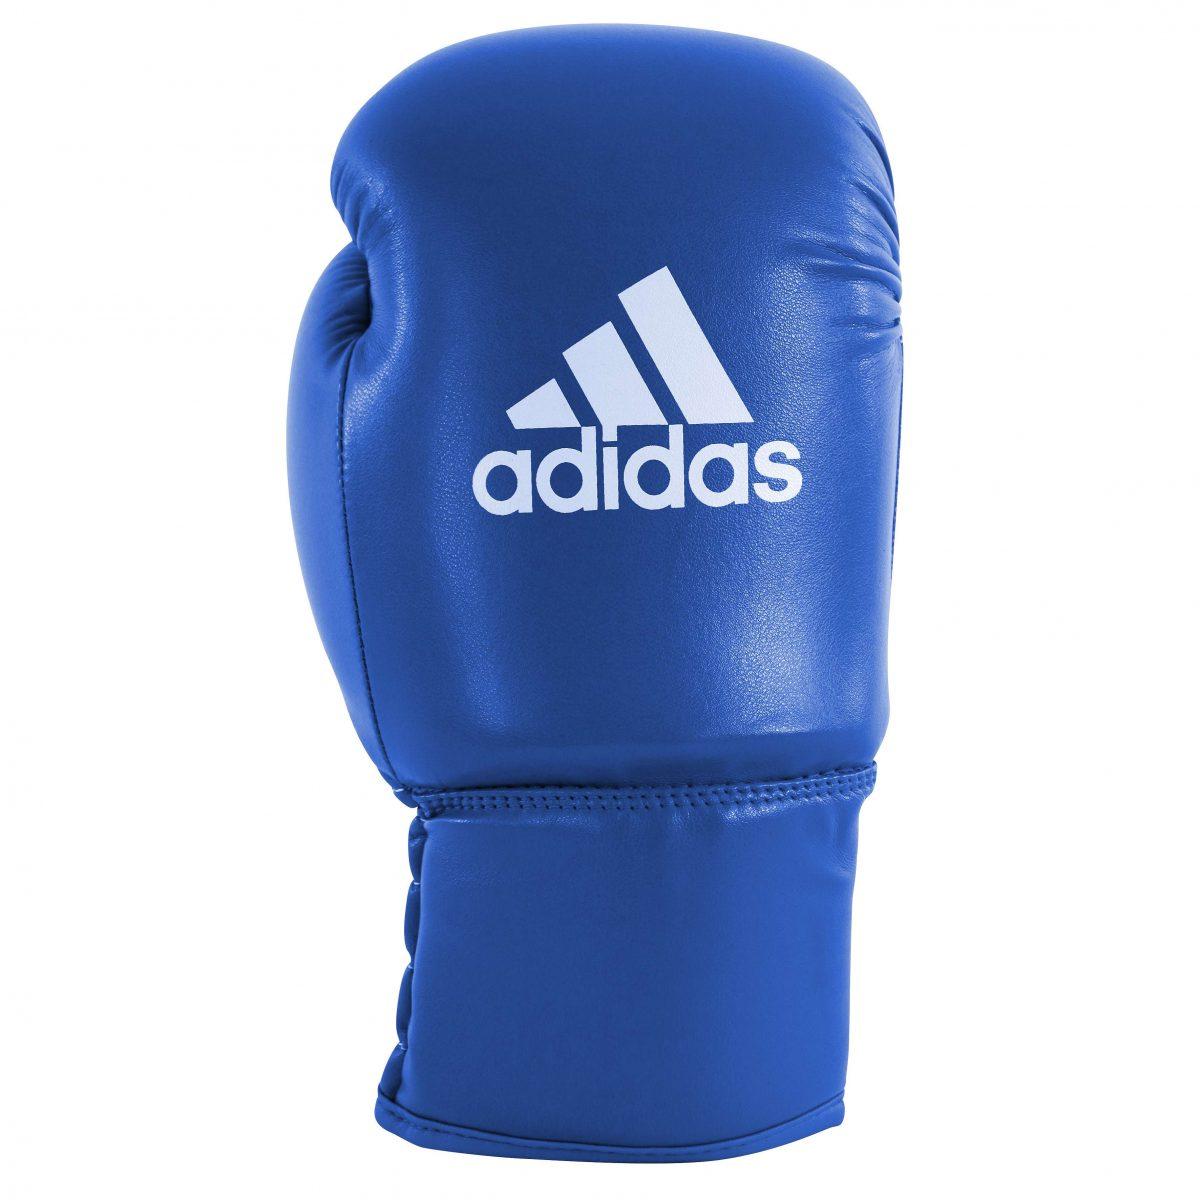 "Adidas Boxhandschuhe ""Kids"""